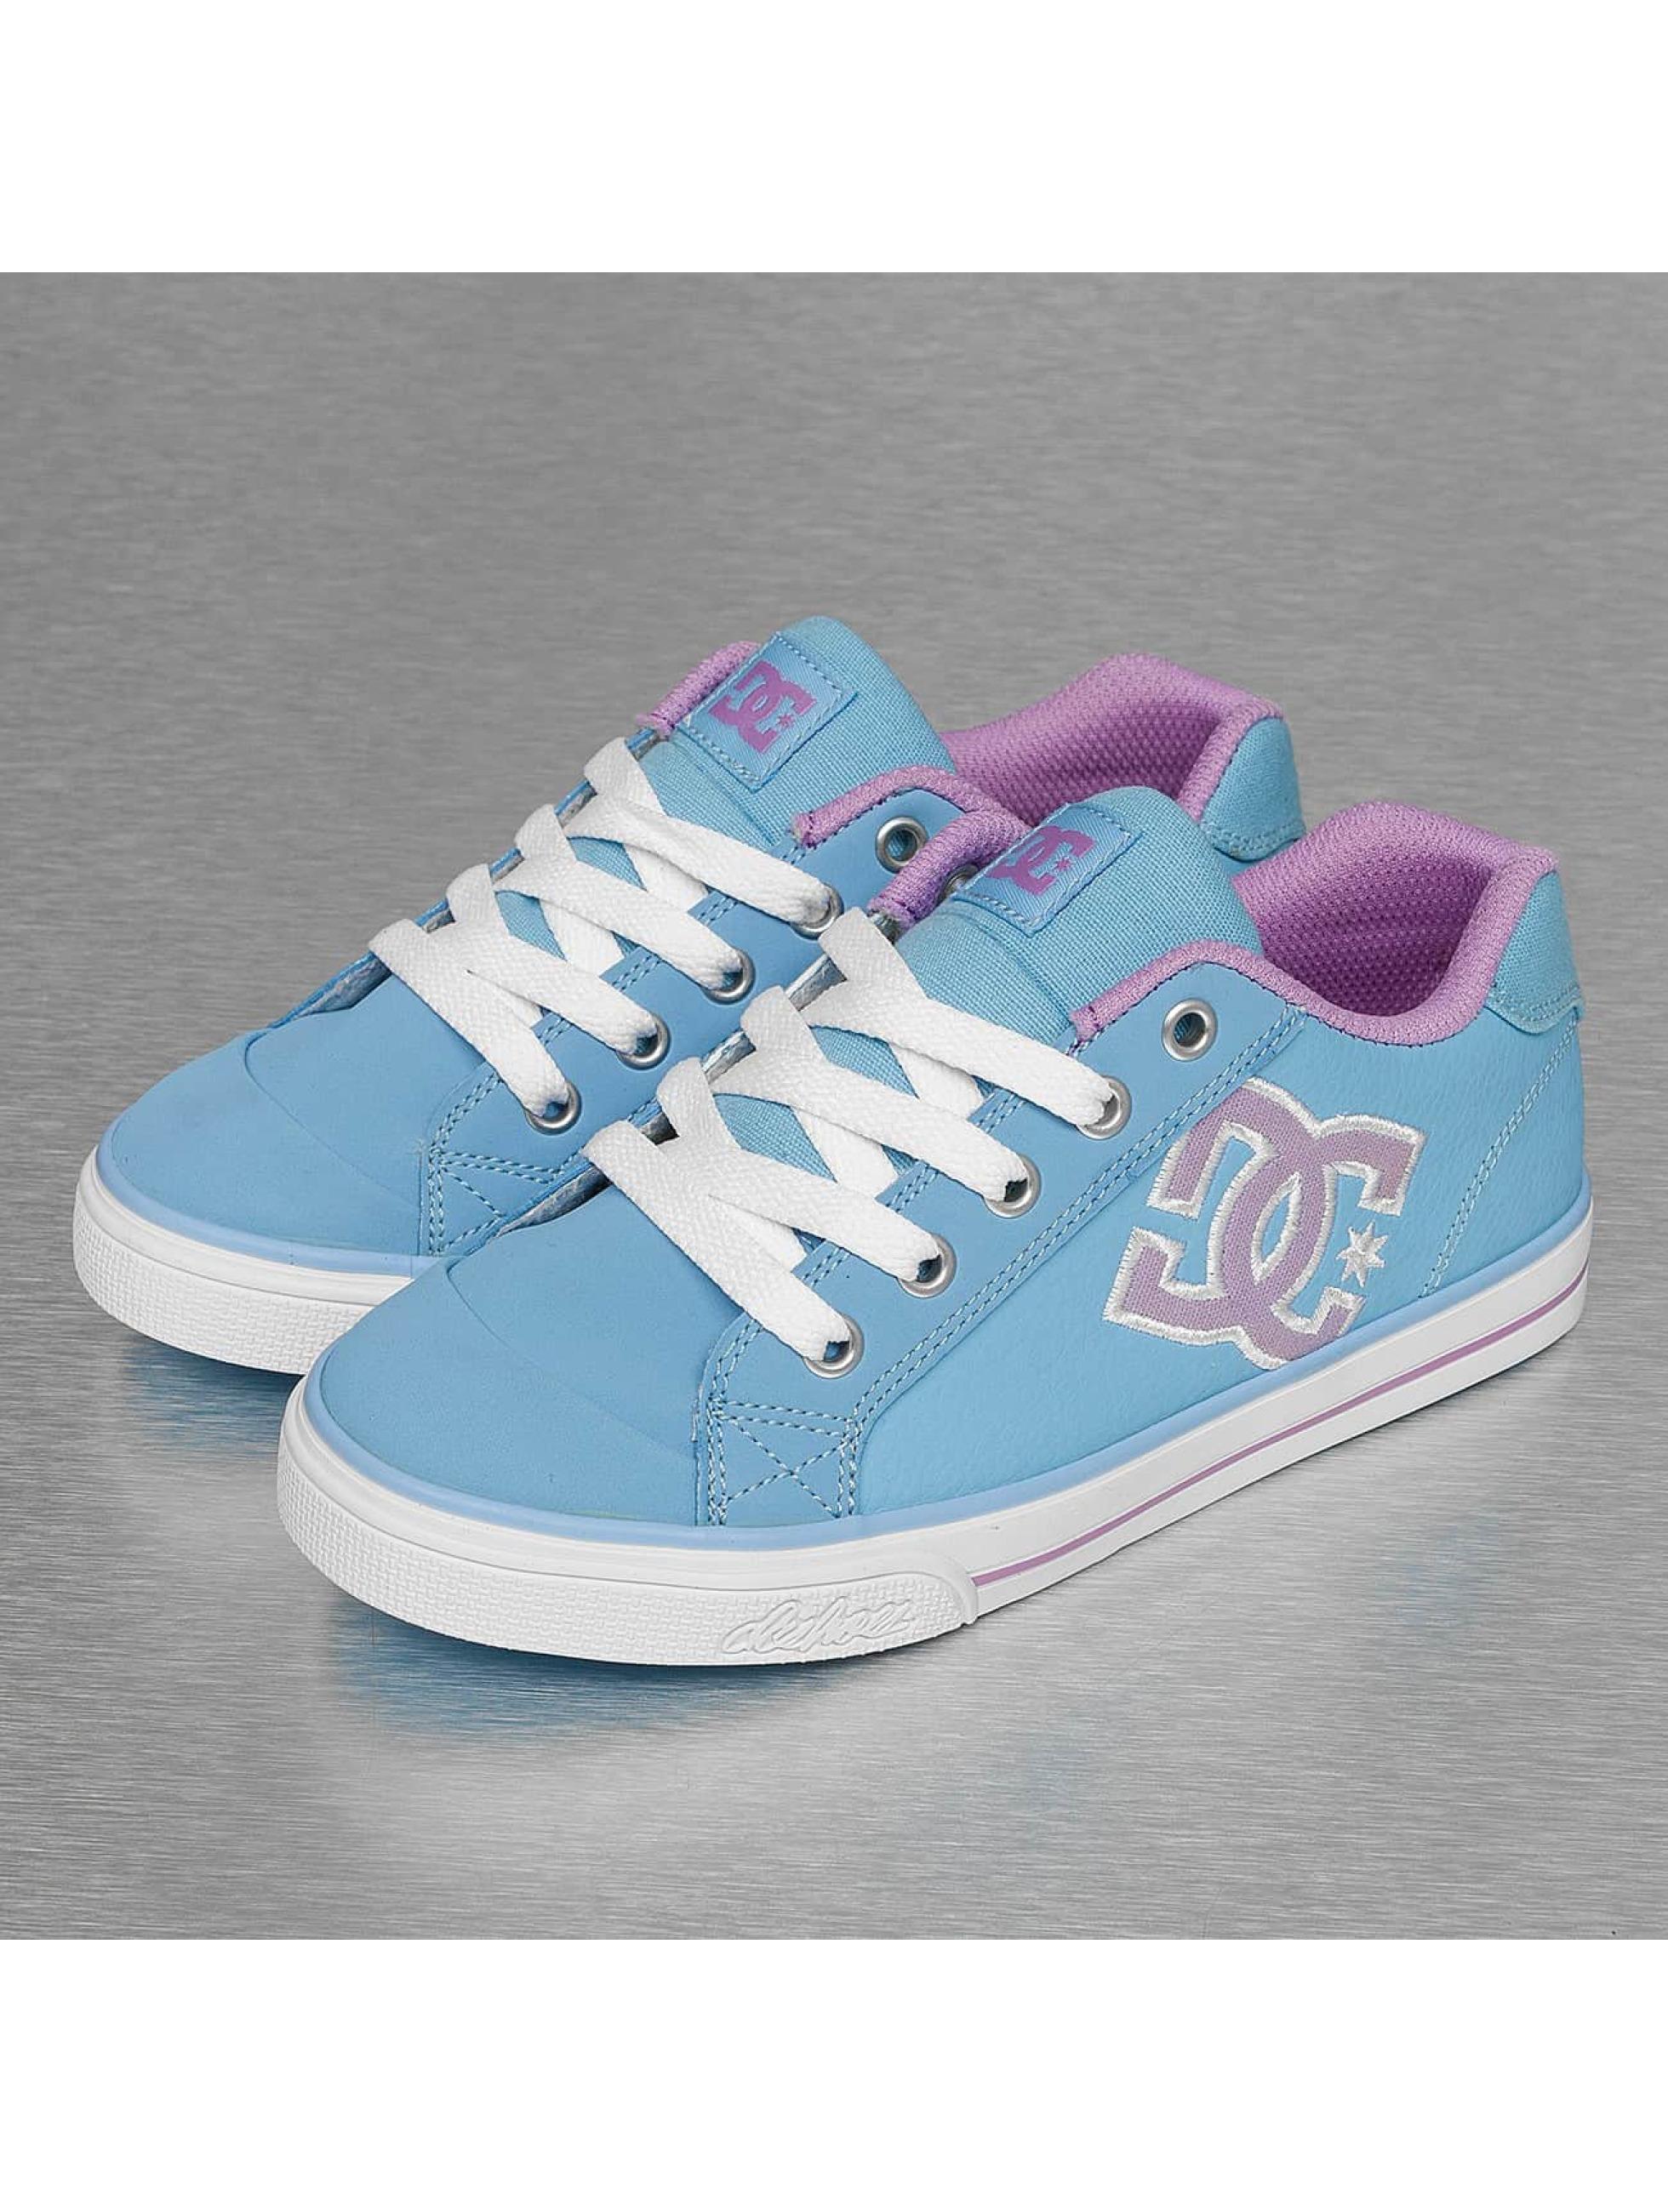 DC Frauen,Kinder Sneaker Chelsea SE in blau